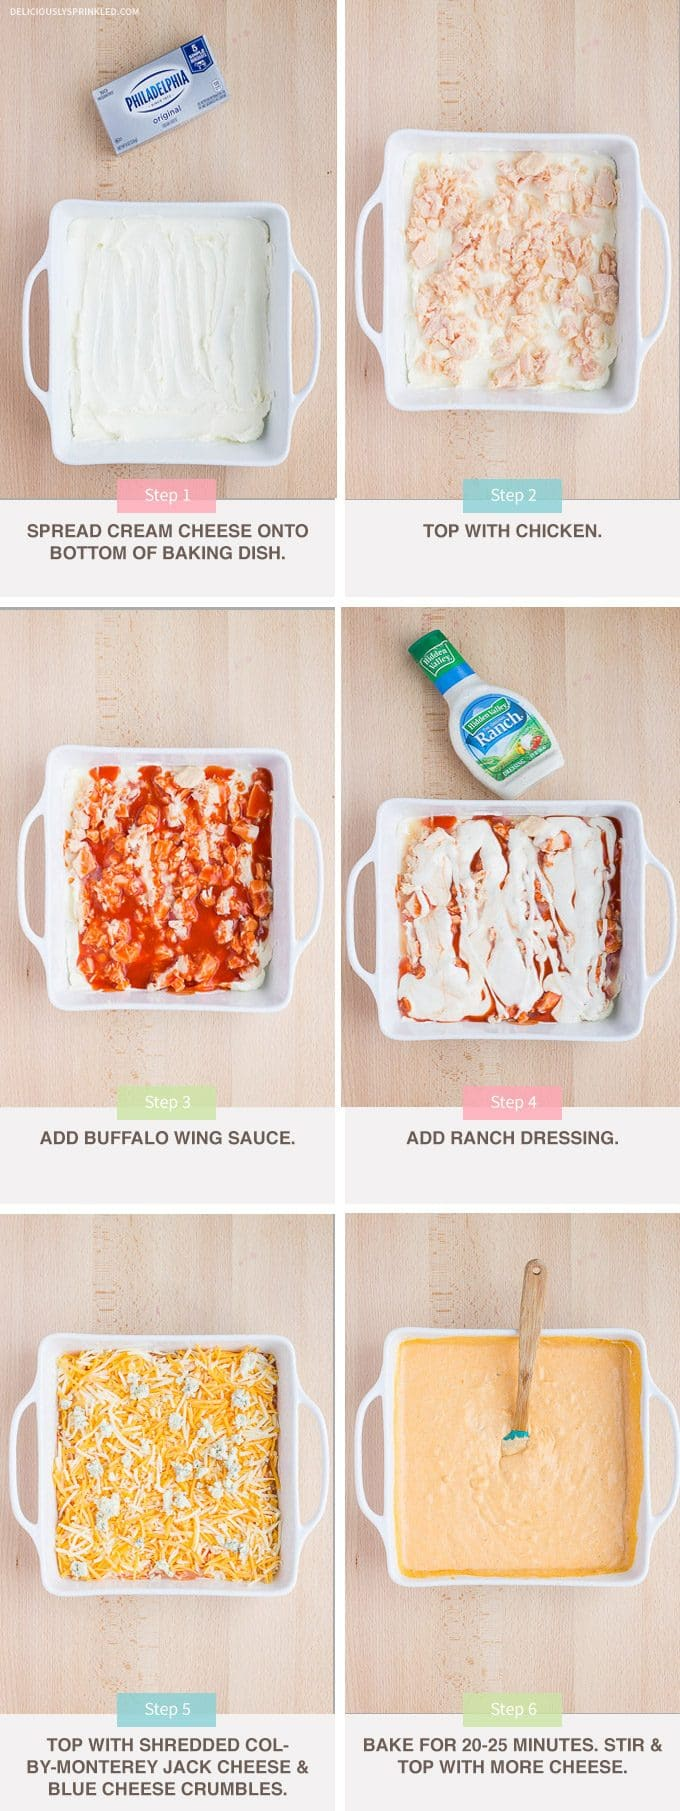 How To Make Buffalo Chicken Dip